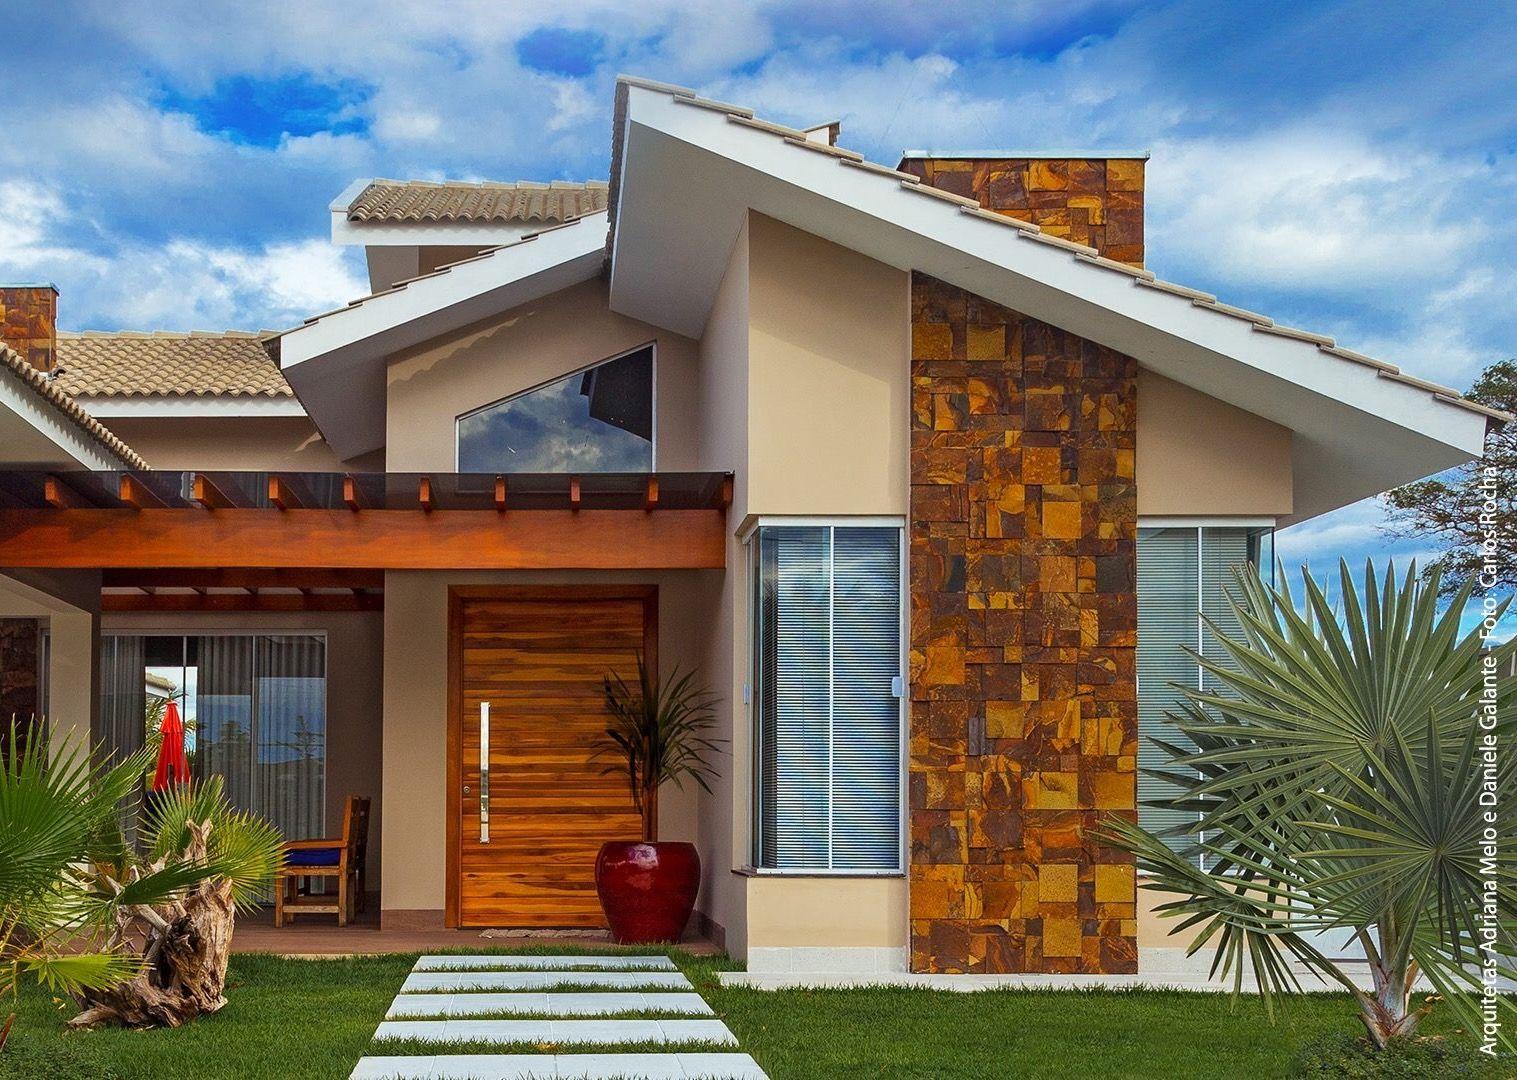 Muito linda est casa kiosko pinterest fachadas for Fachadas de casas modernas 1 pavimento